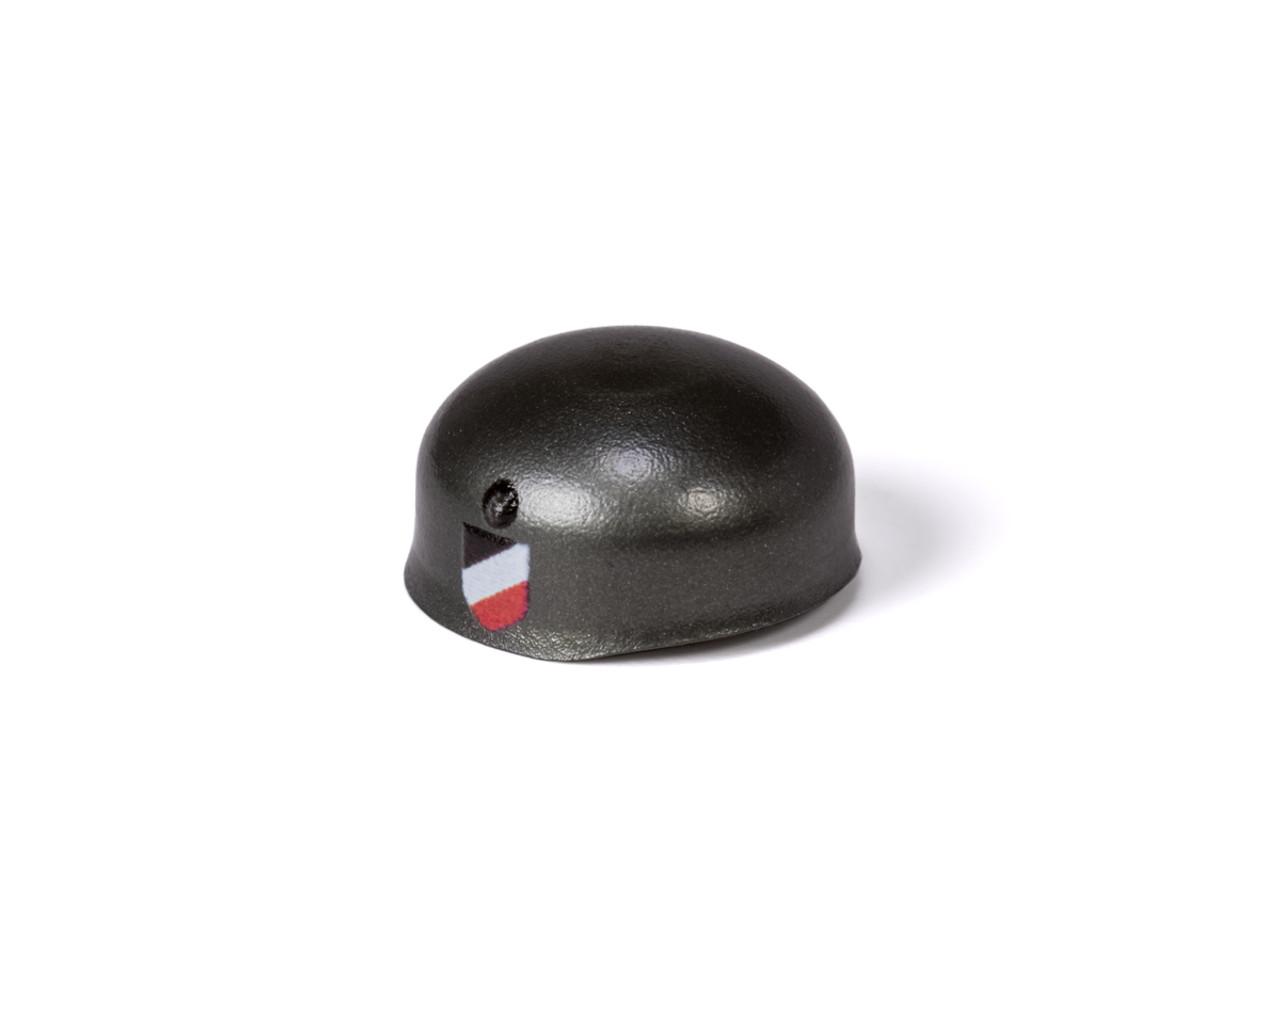 WWII Fallschirmjäger Helmet with Side Prints (Gunmetal)